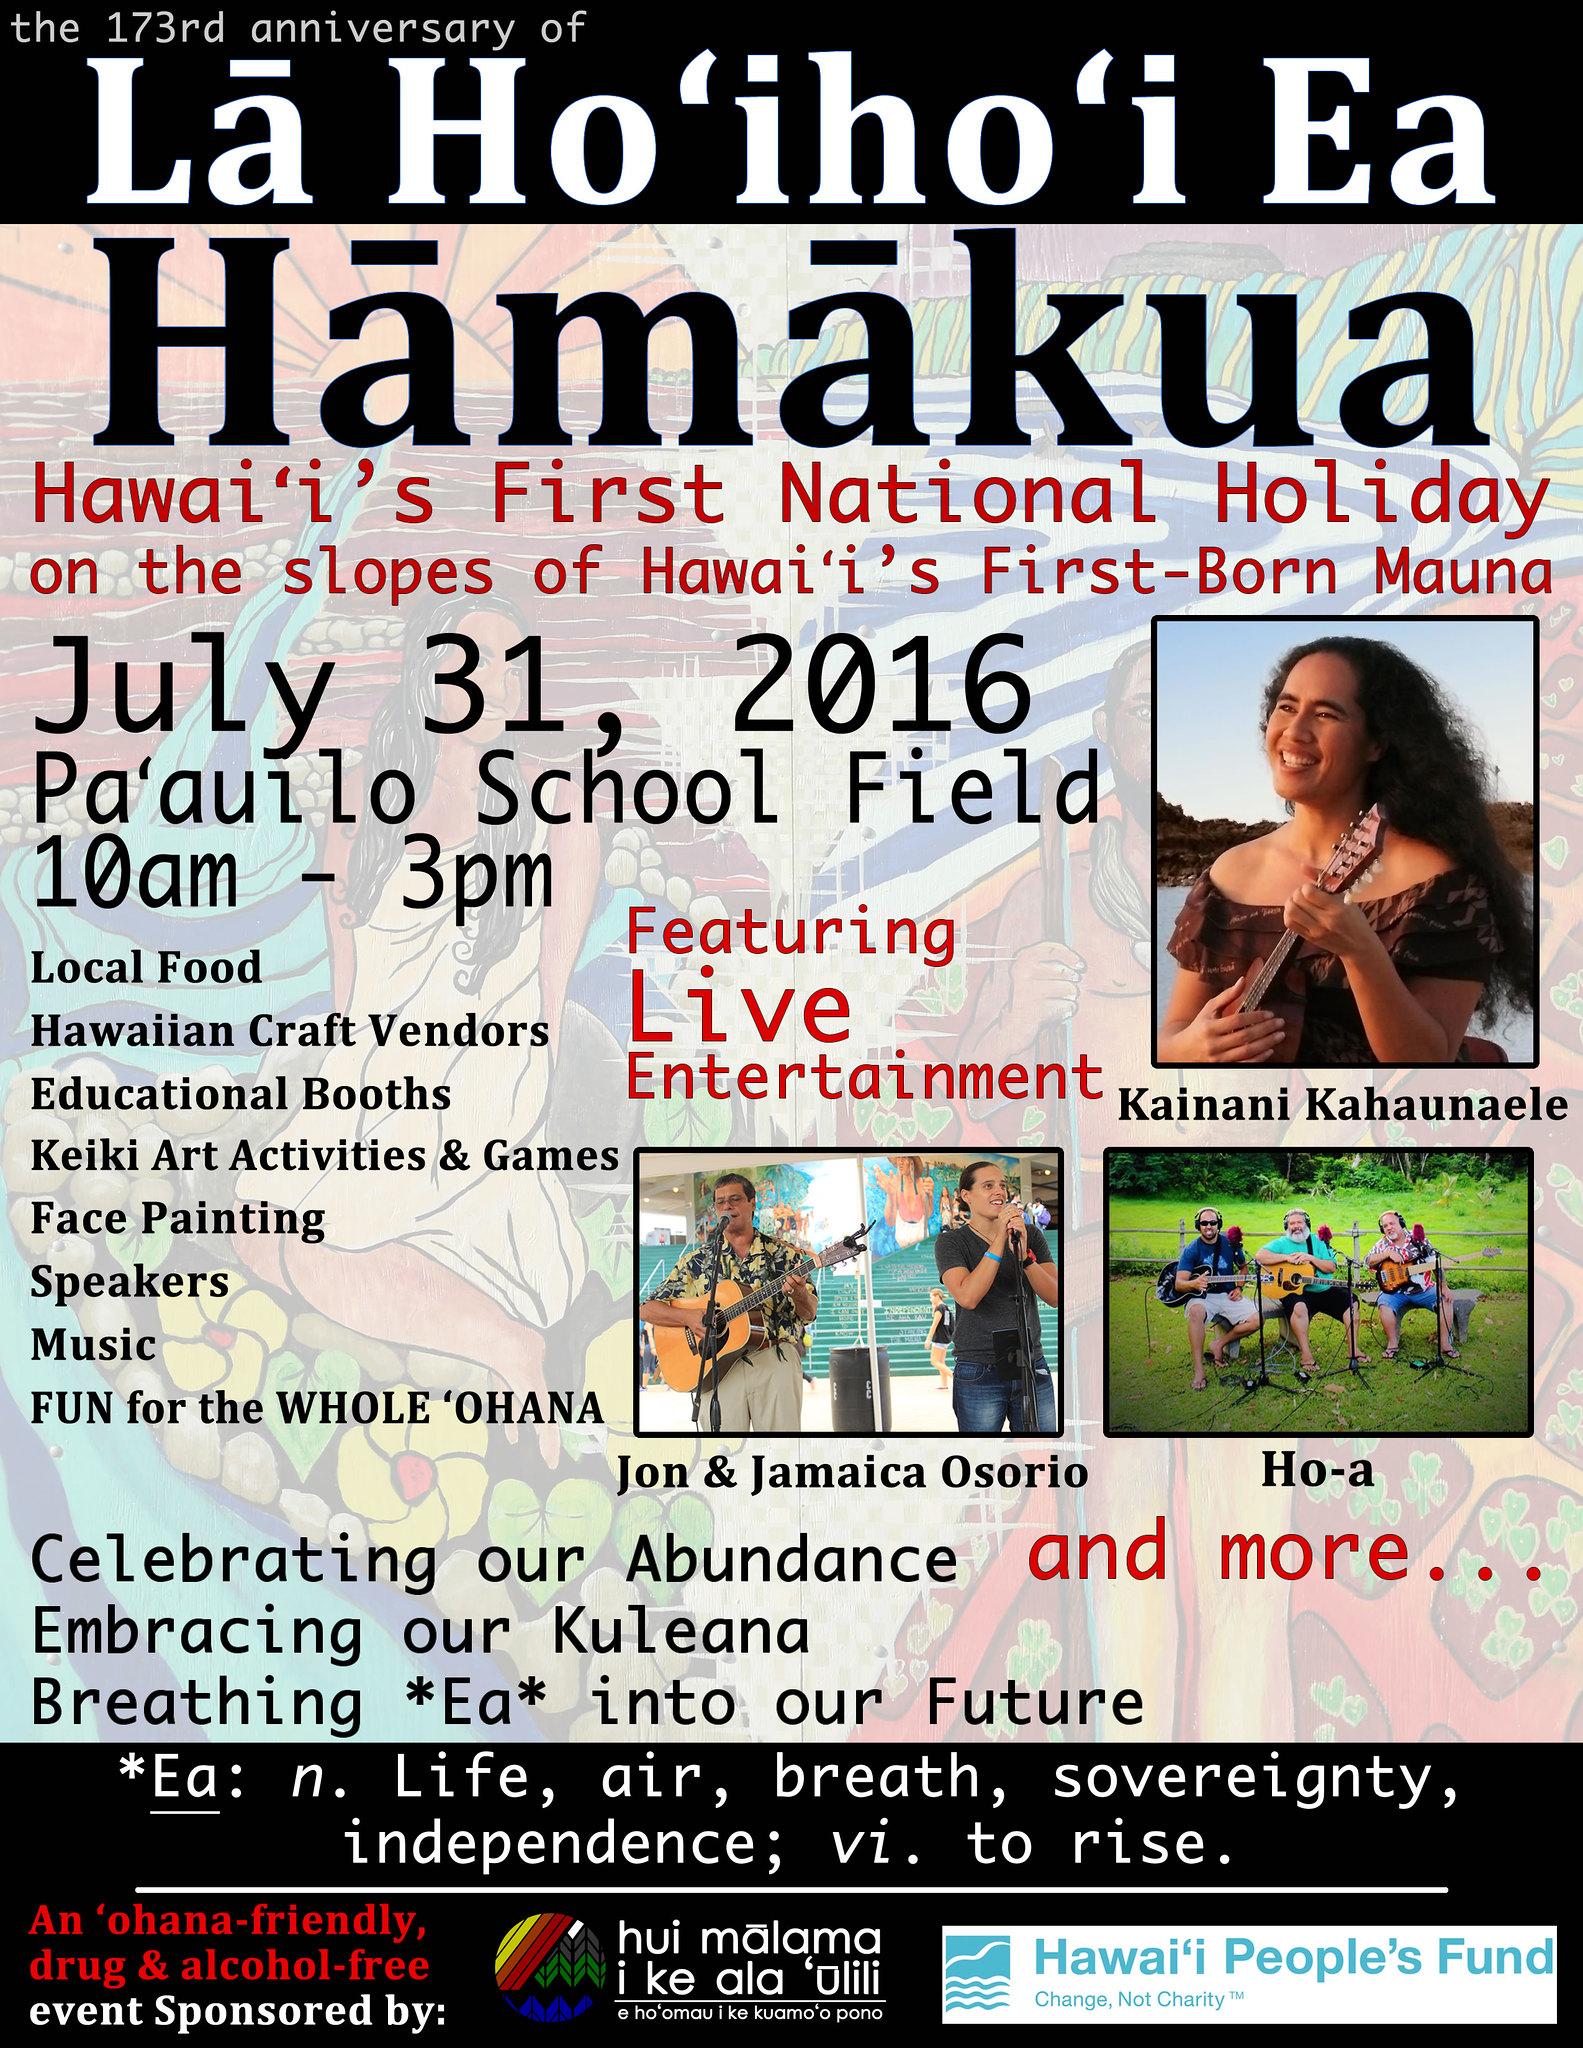 LHE HAMAKUA 2016_Event Flyer